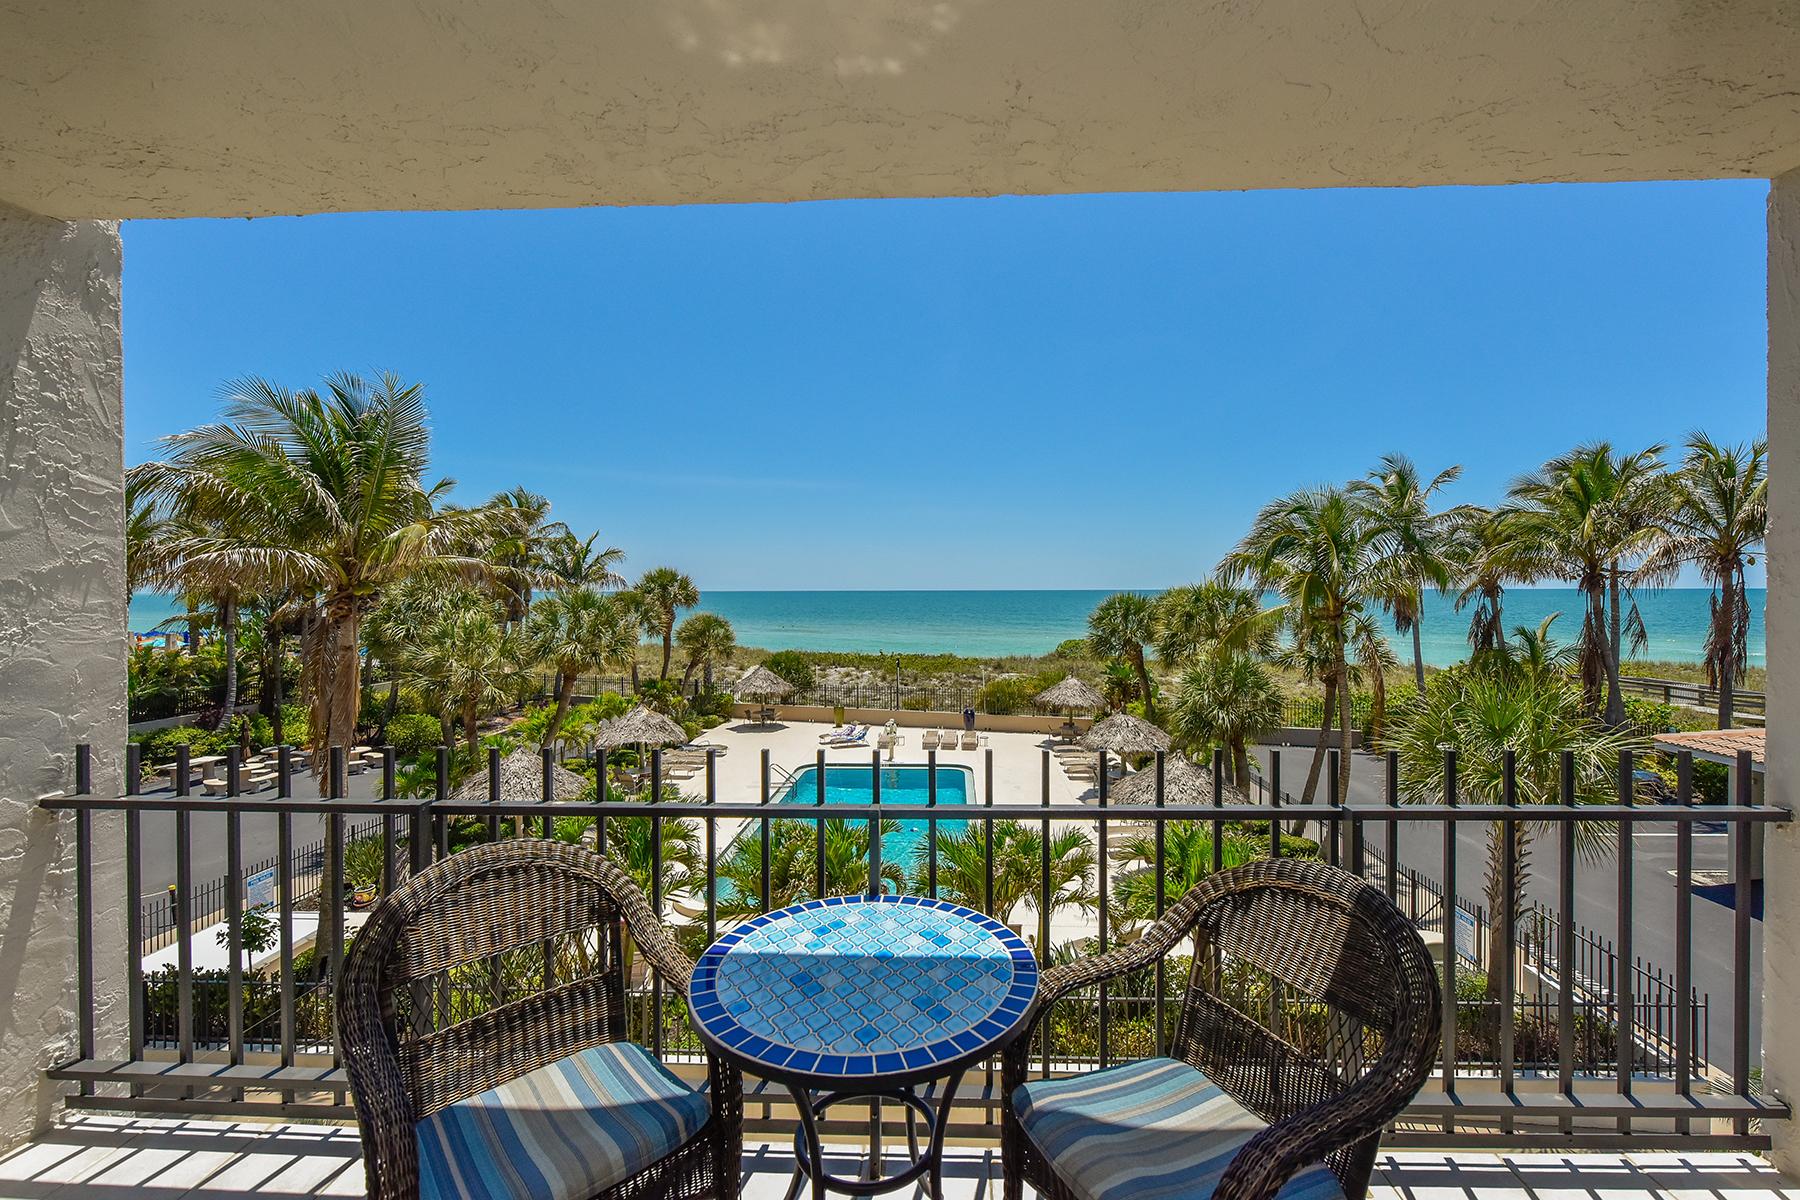 Condominio por un Venta en LIDO BEACH 1212 Benjamin Franklin Dr 202 Sarasota, Florida, 34236 Estados Unidos